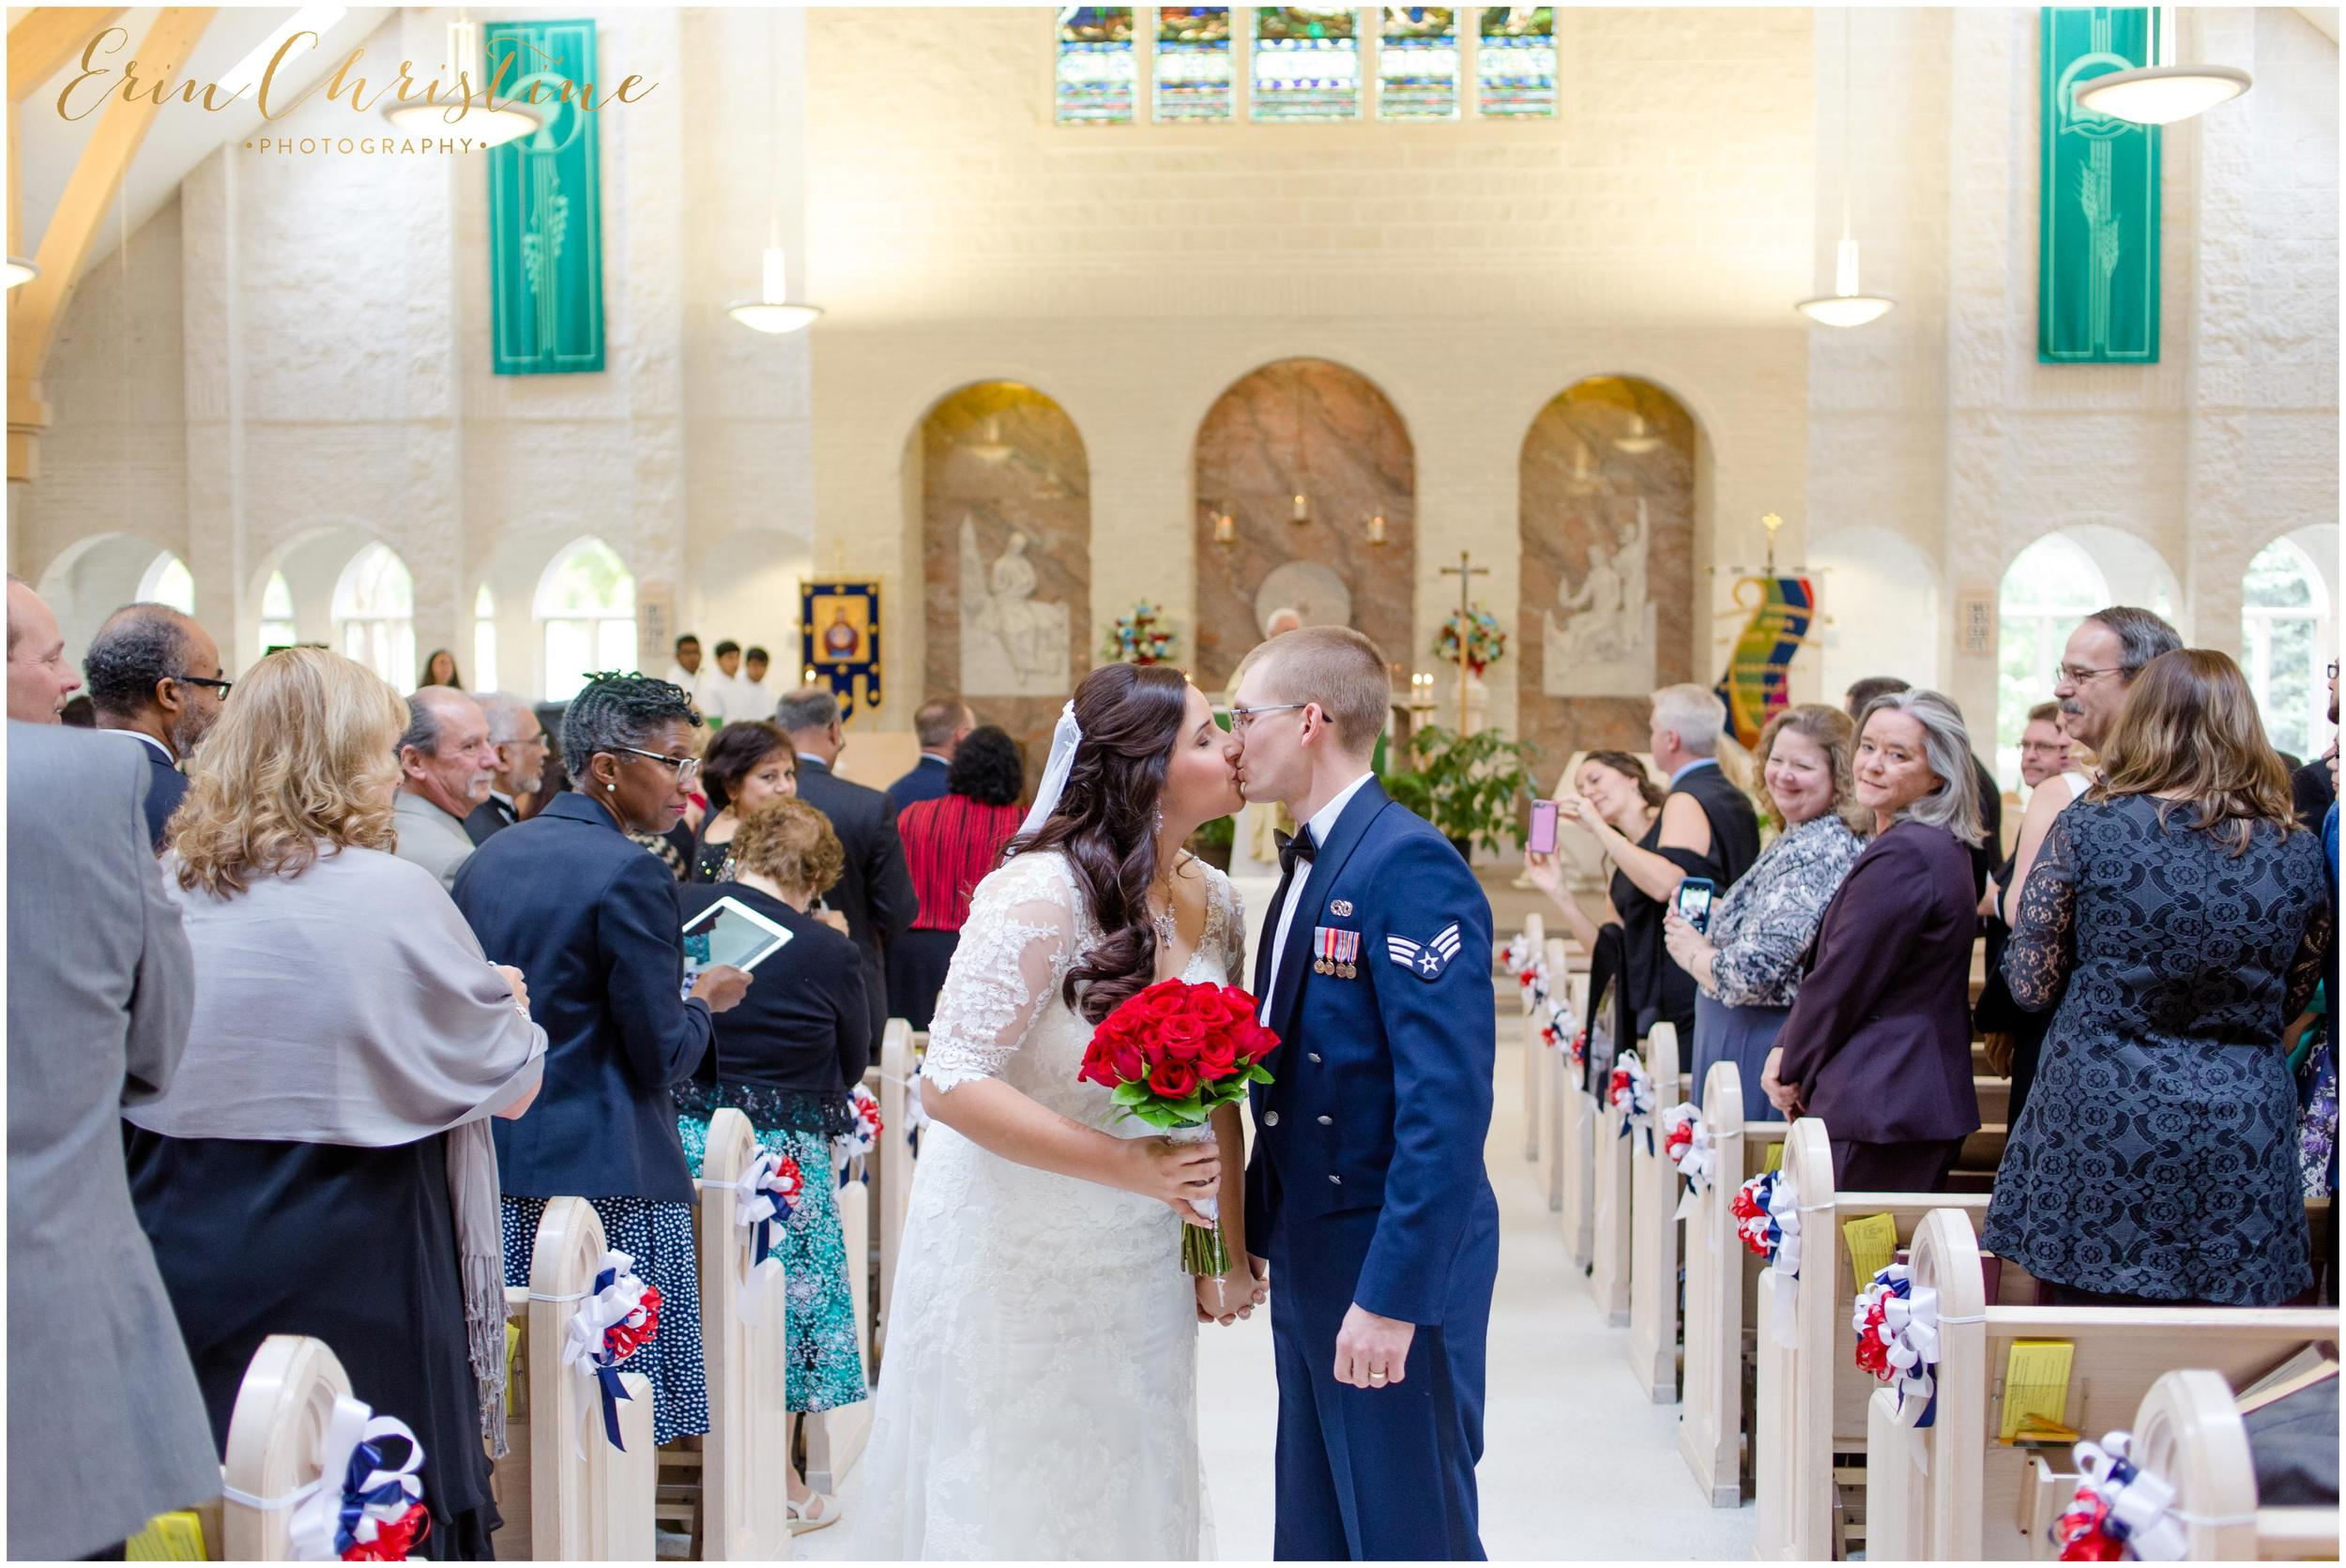 Catholic Ceremony Jesus The Good Shephered-9179.jpg